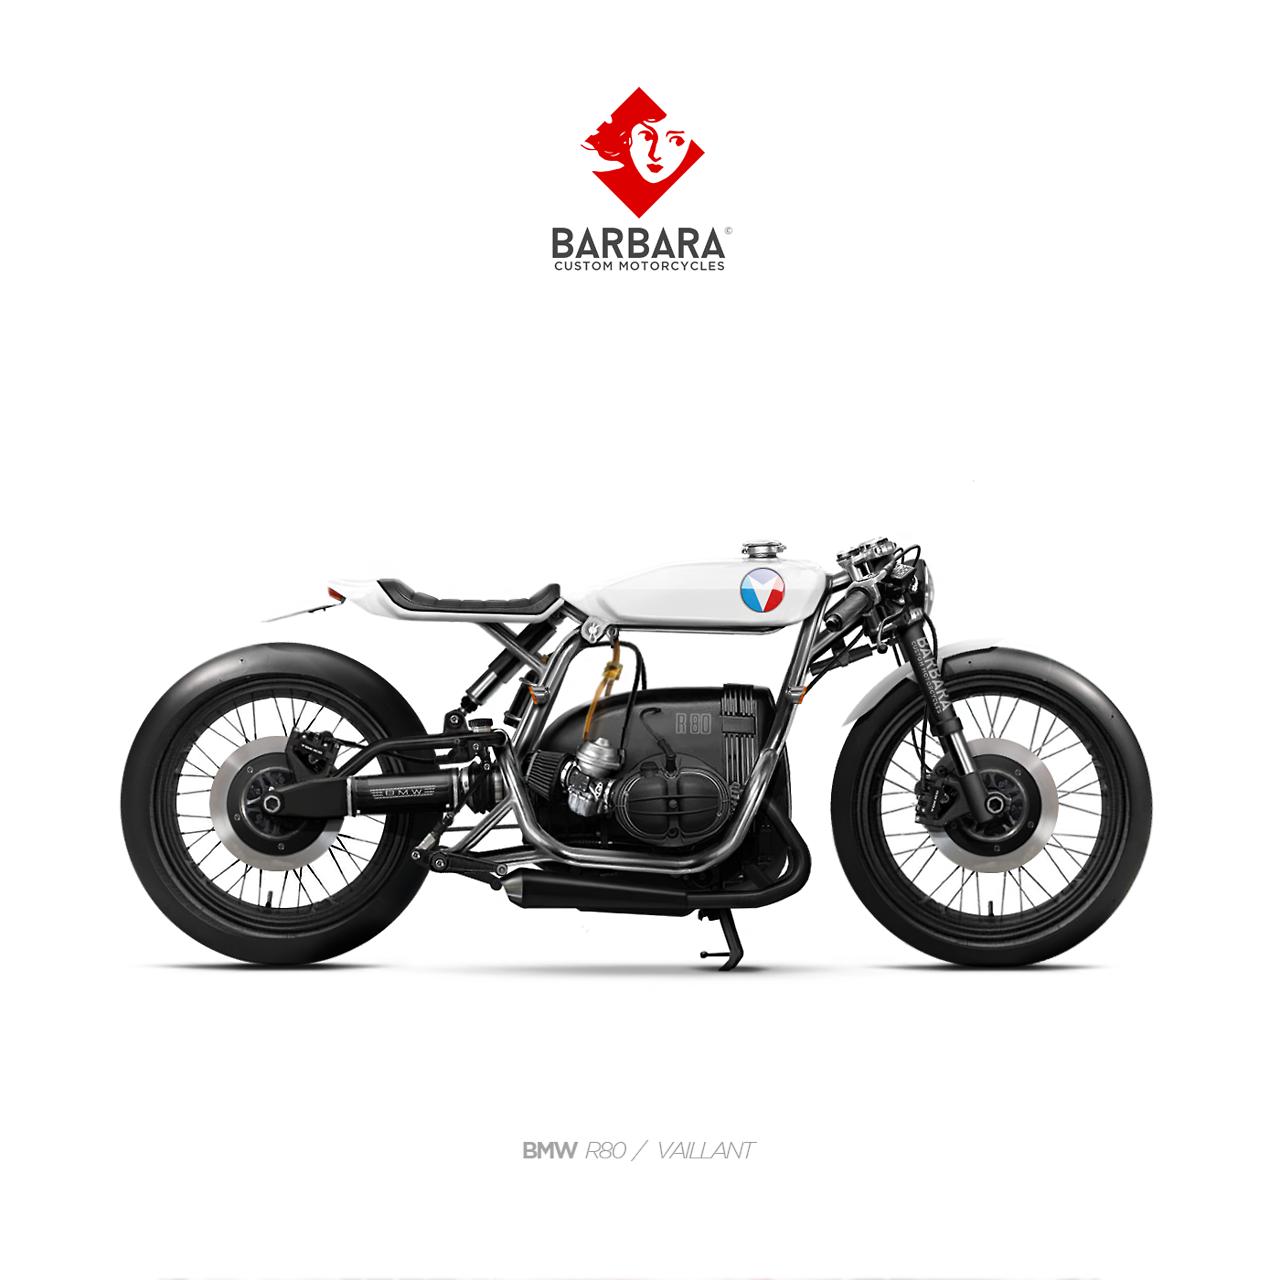 barbara motorcycles photo caffeine on speed getunte. Black Bedroom Furniture Sets. Home Design Ideas